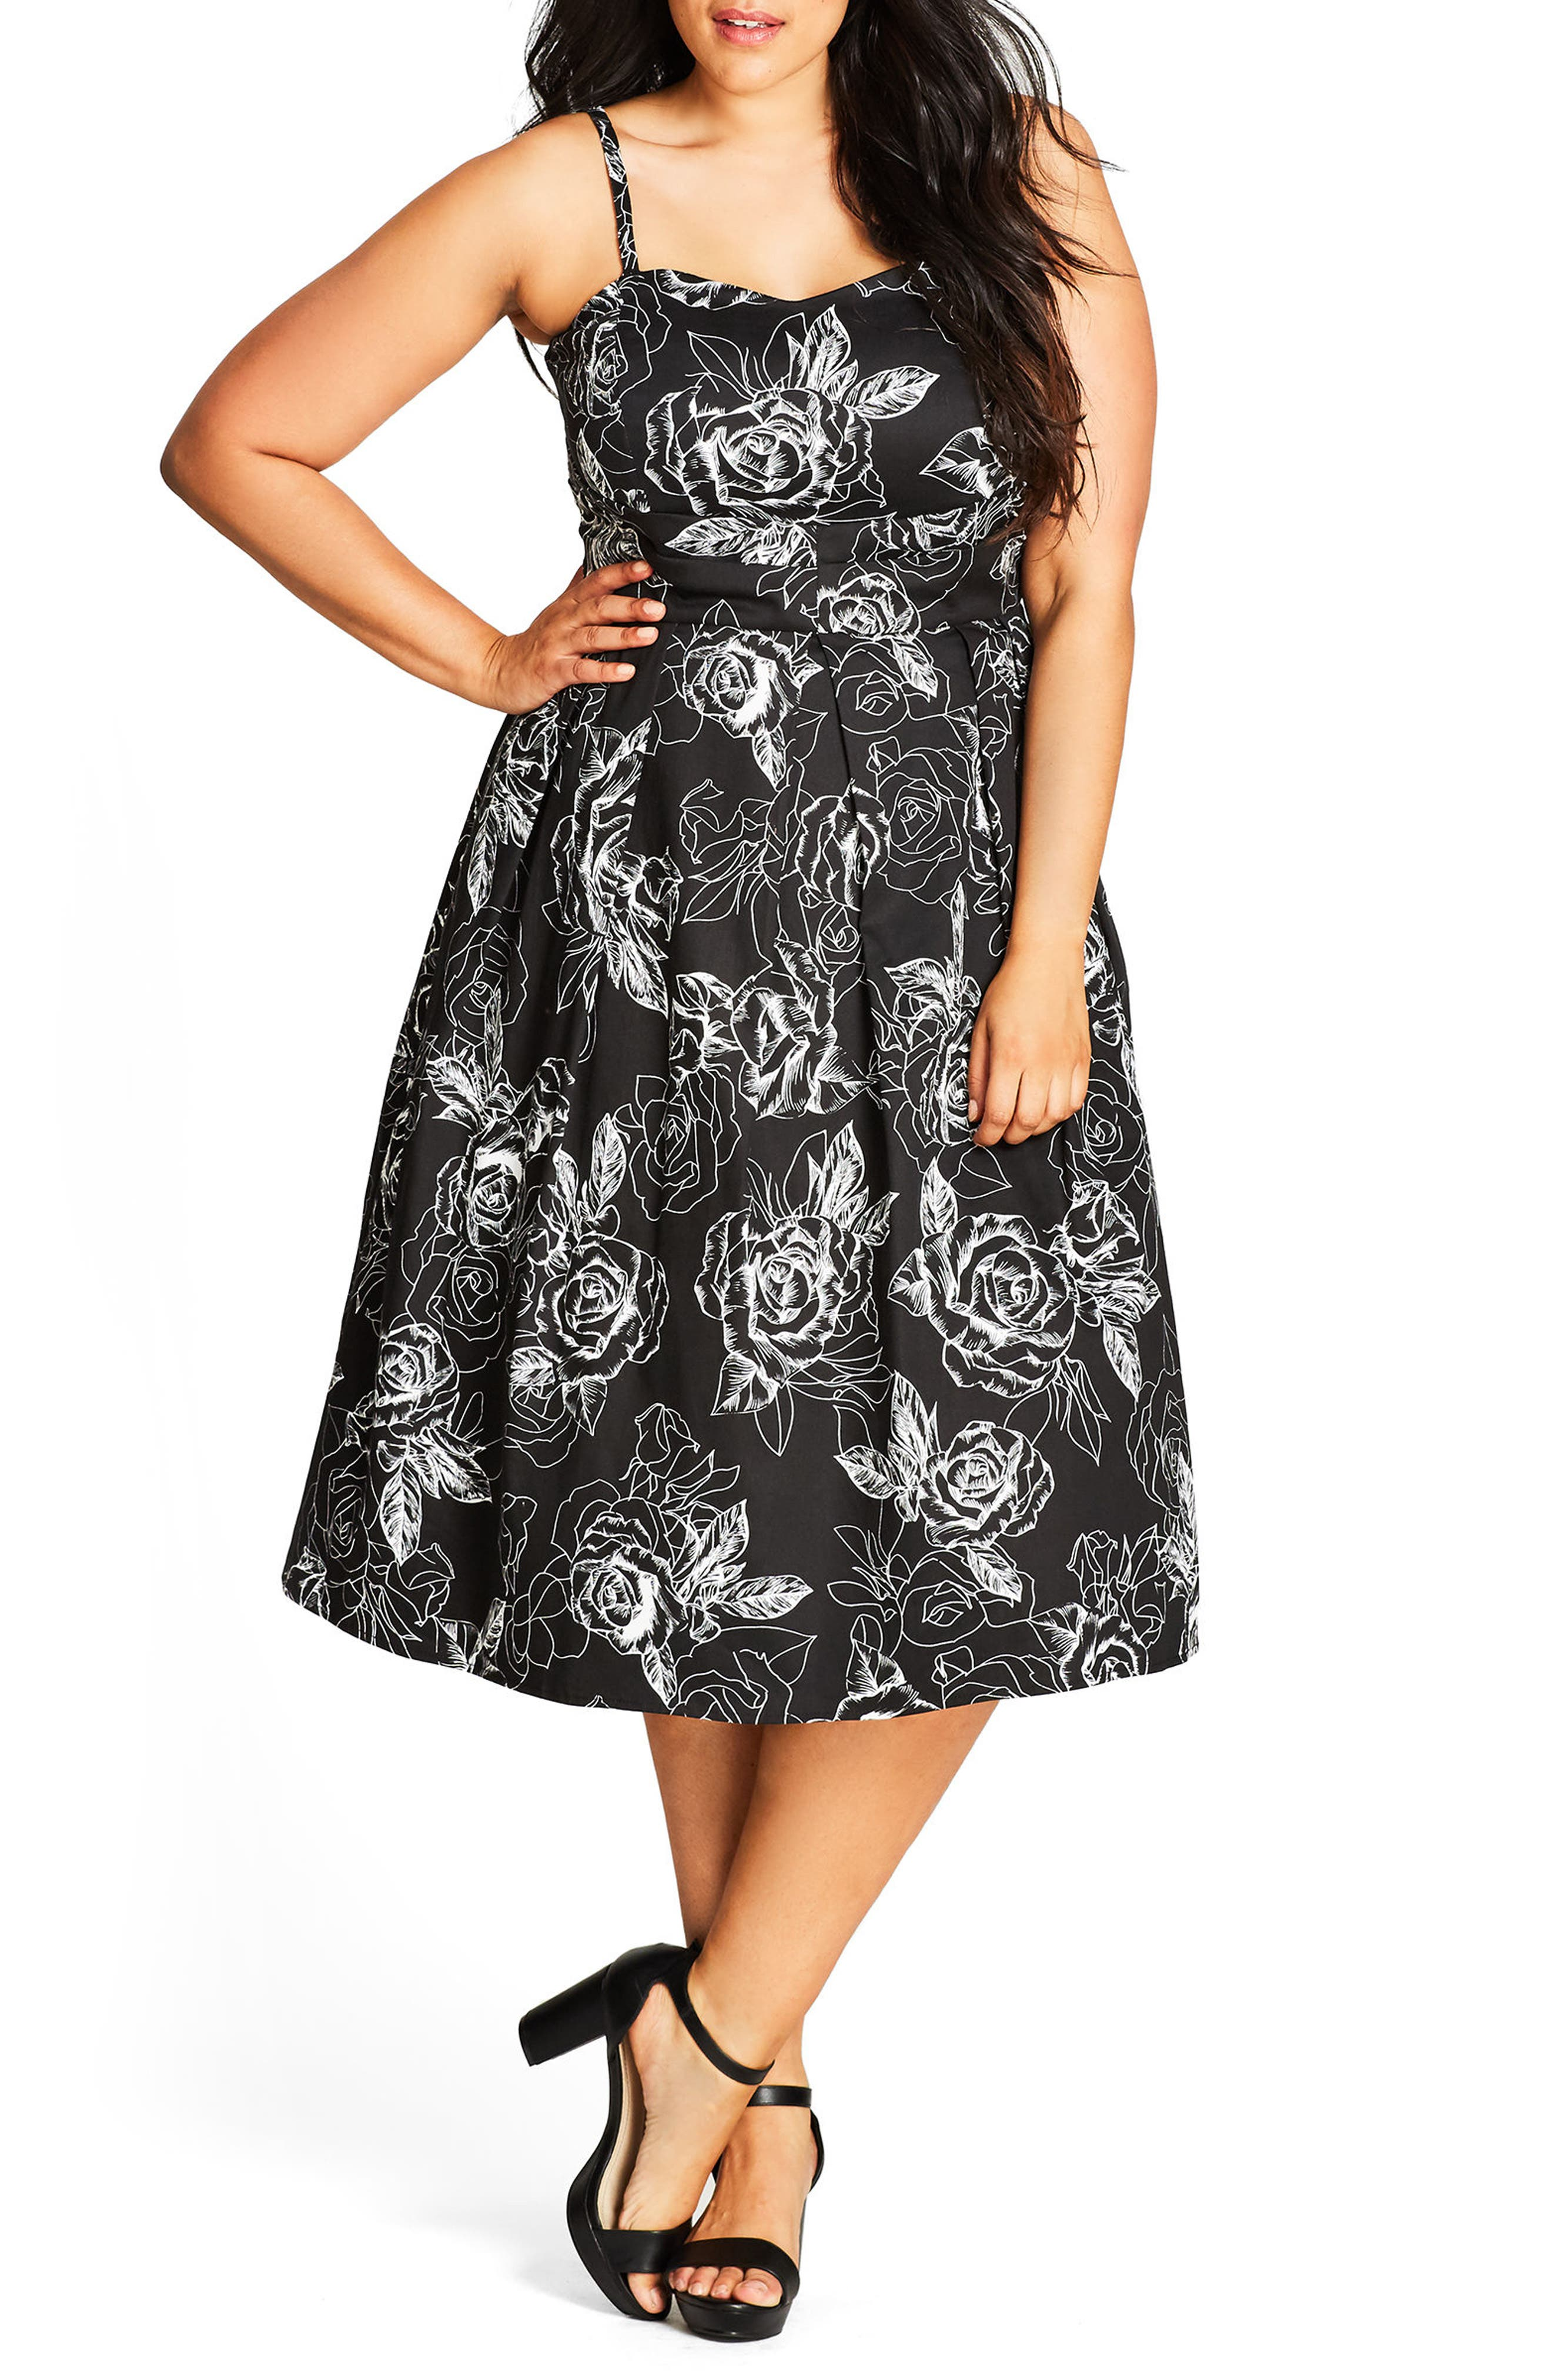 City Chic Mono Garden Fit & Flare Dress (Plus Size)